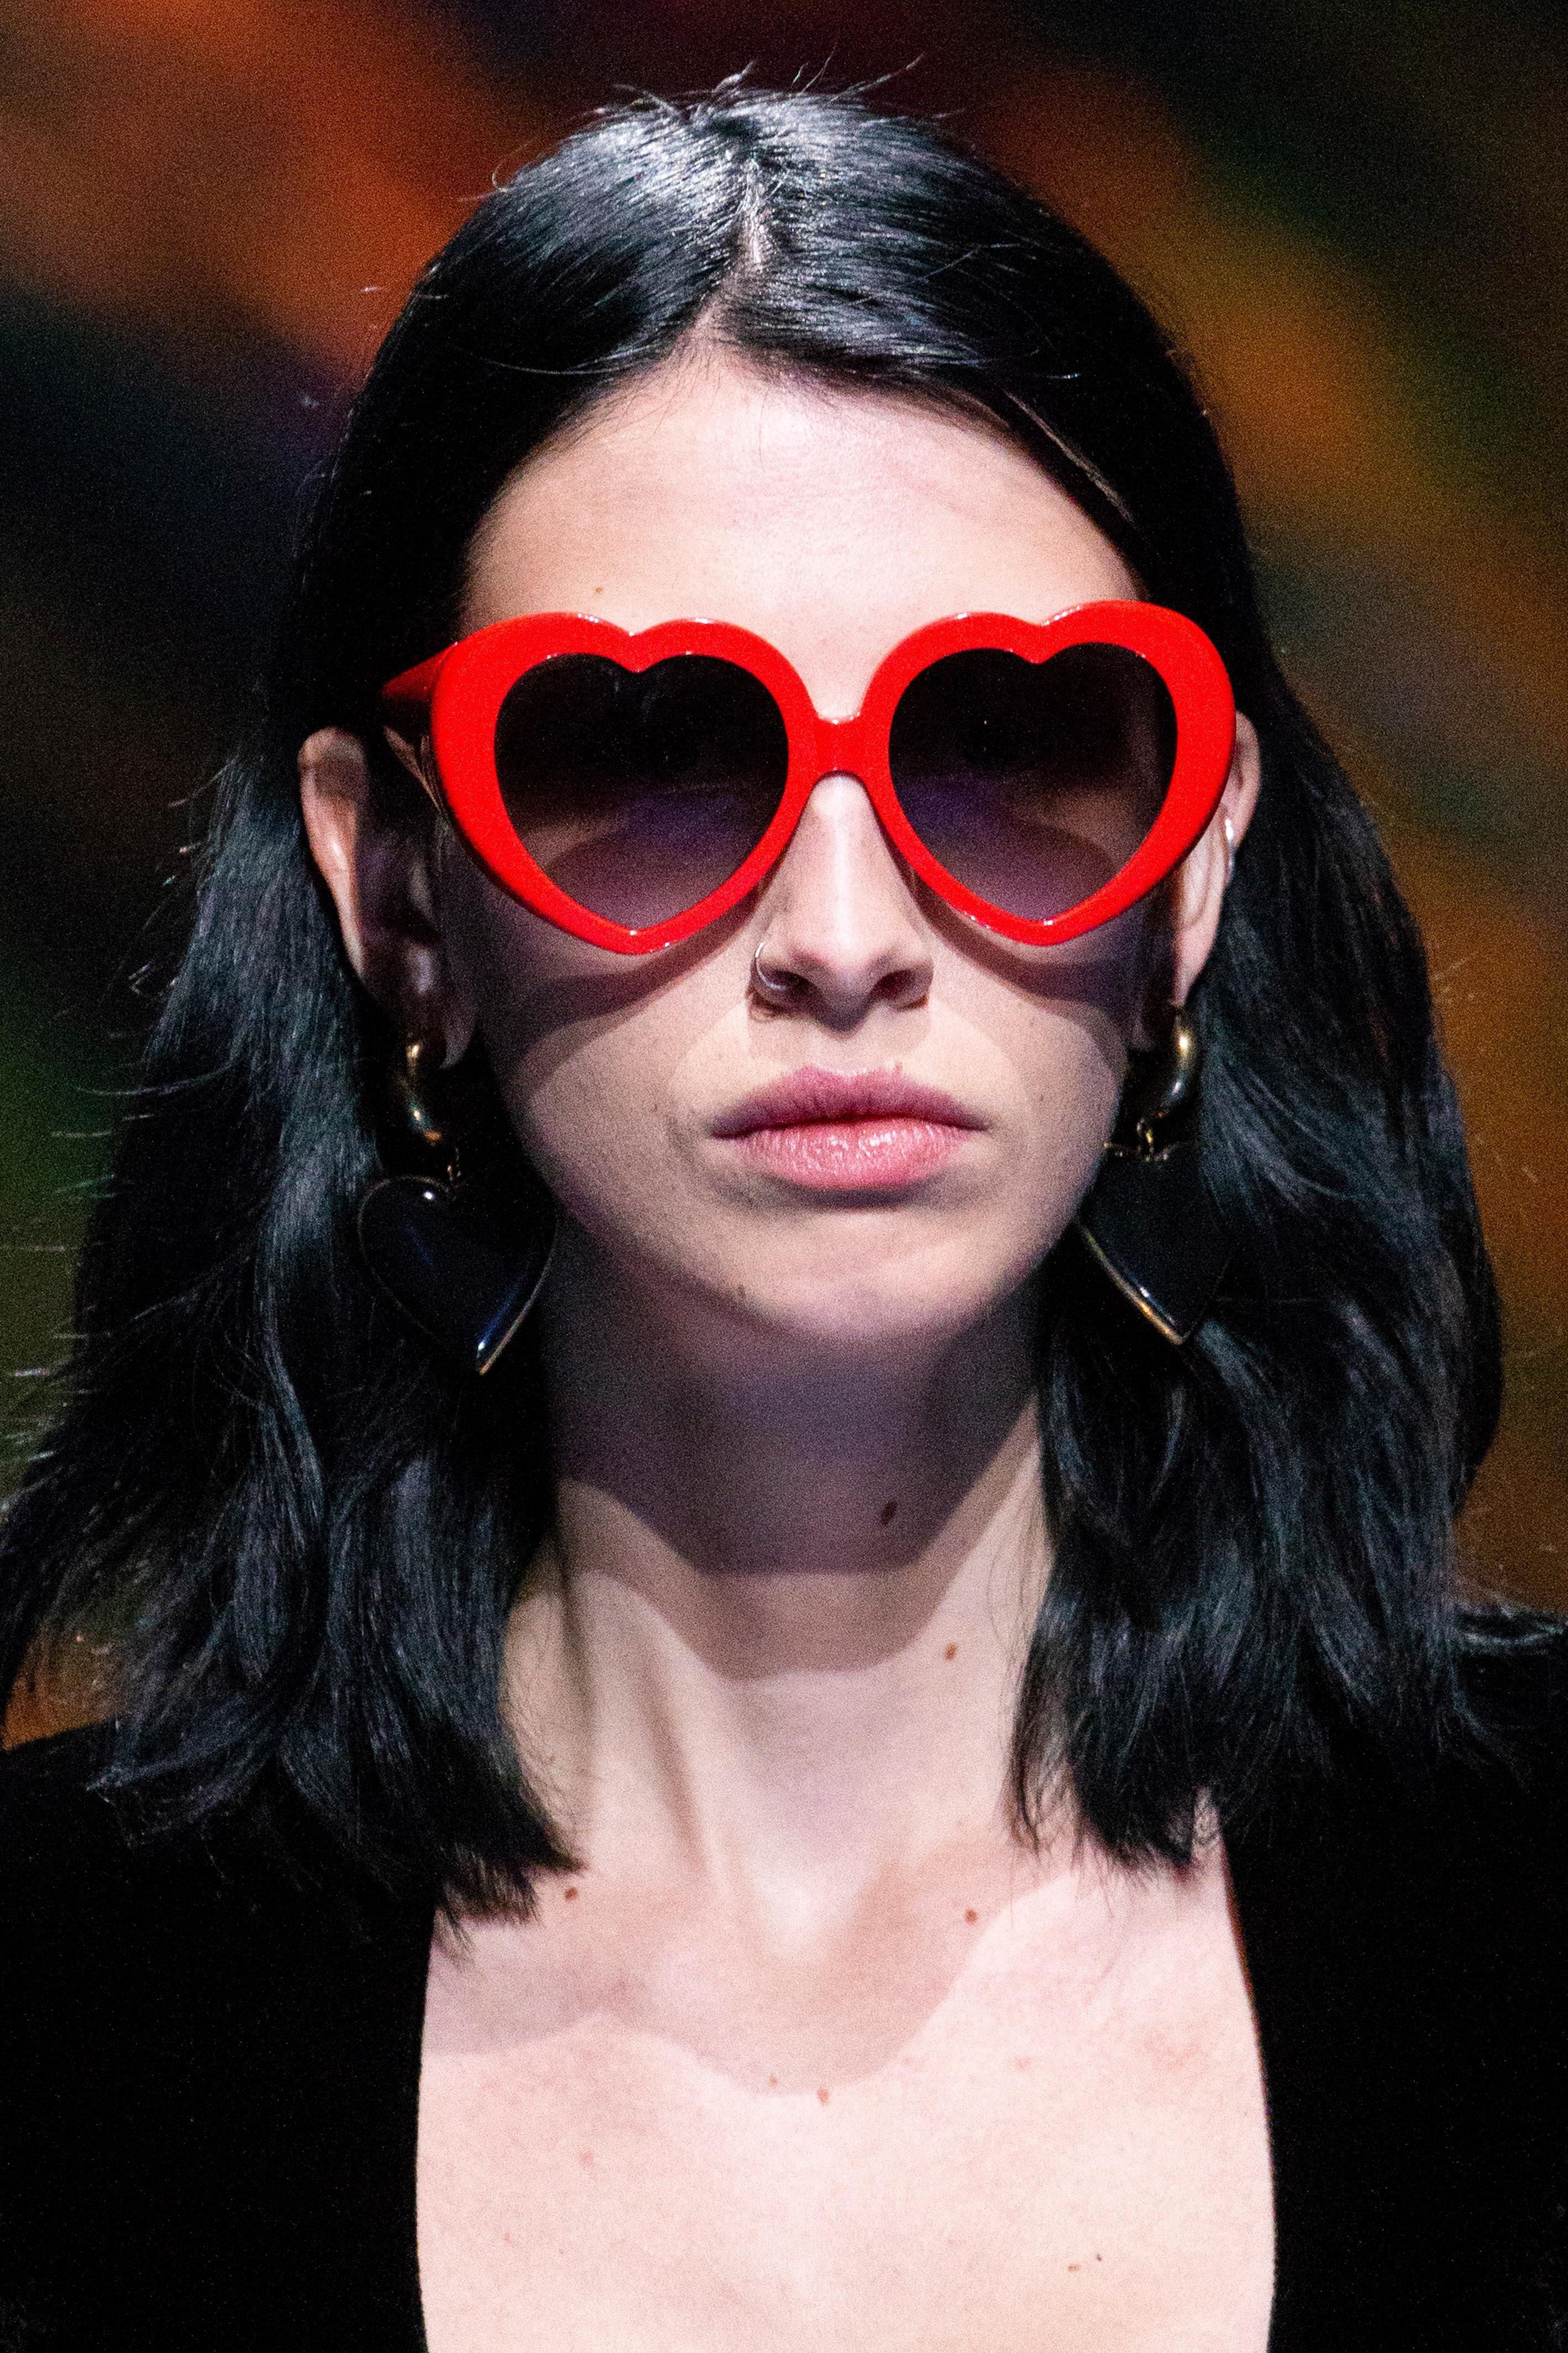 ce623a185 زيّني إطلالاتكِ بالنظارات الشمسية على شكل قلب هذا الصيف!